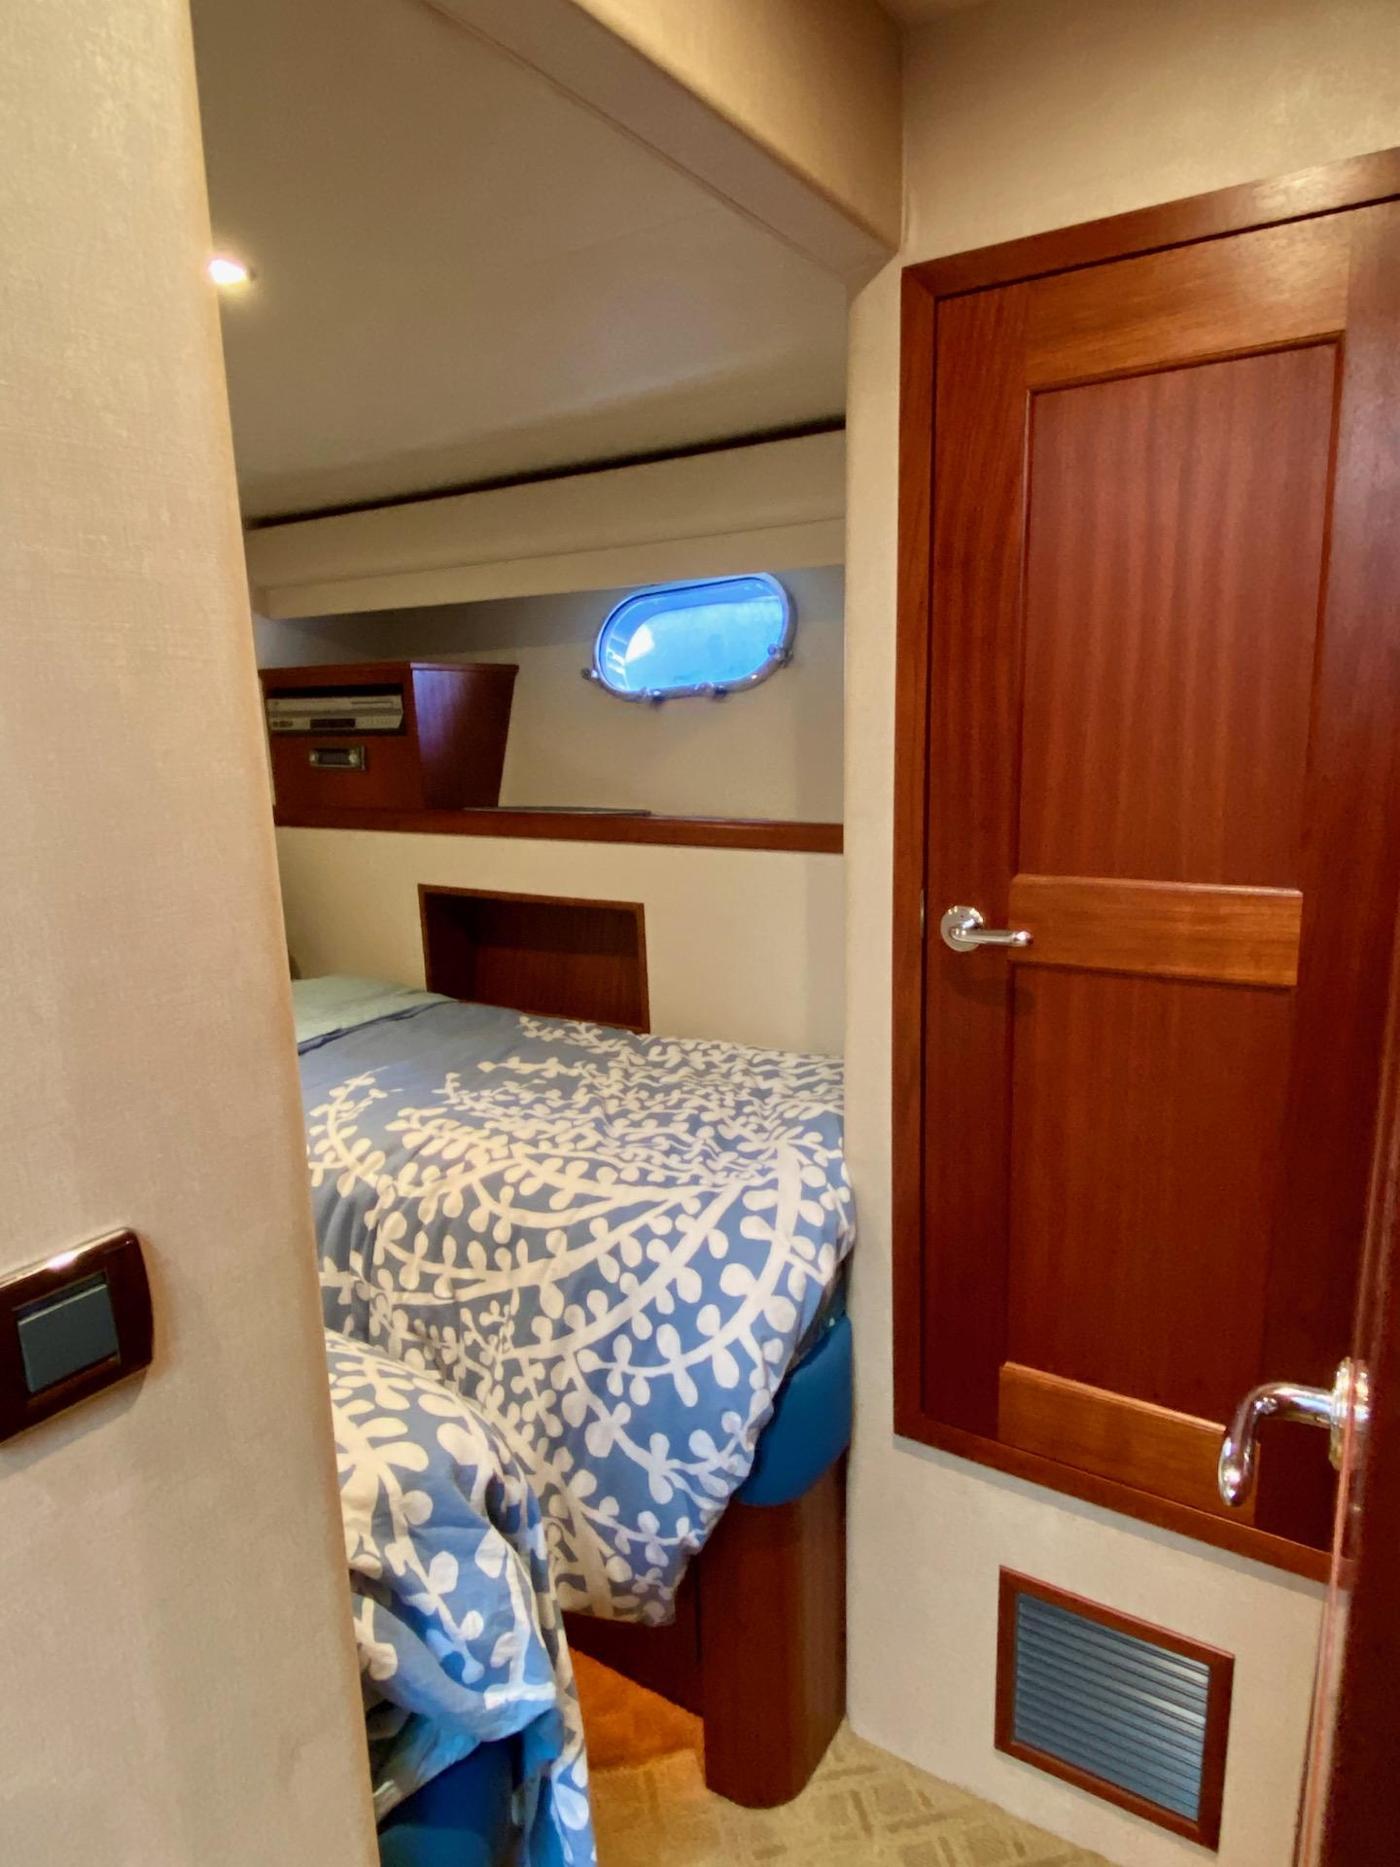 2004 Pacific Mariner 65 Diamond, Port guest cabin